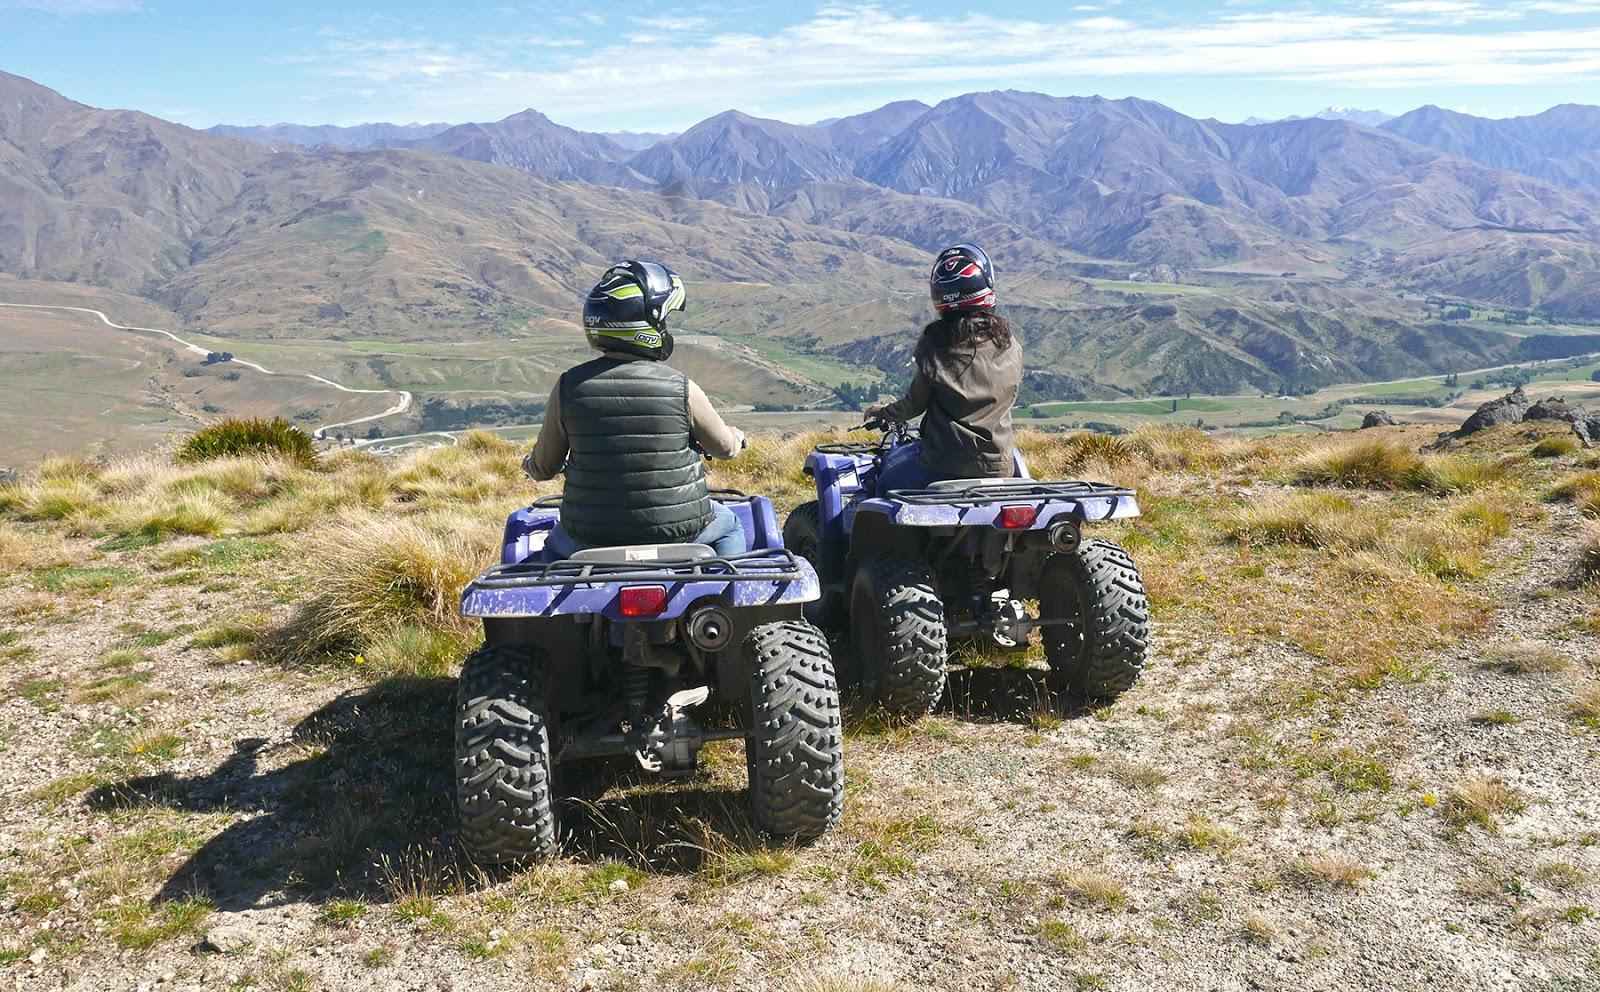 Euriental | luxury travel & style | Cardrona quad bikes, New Zealand